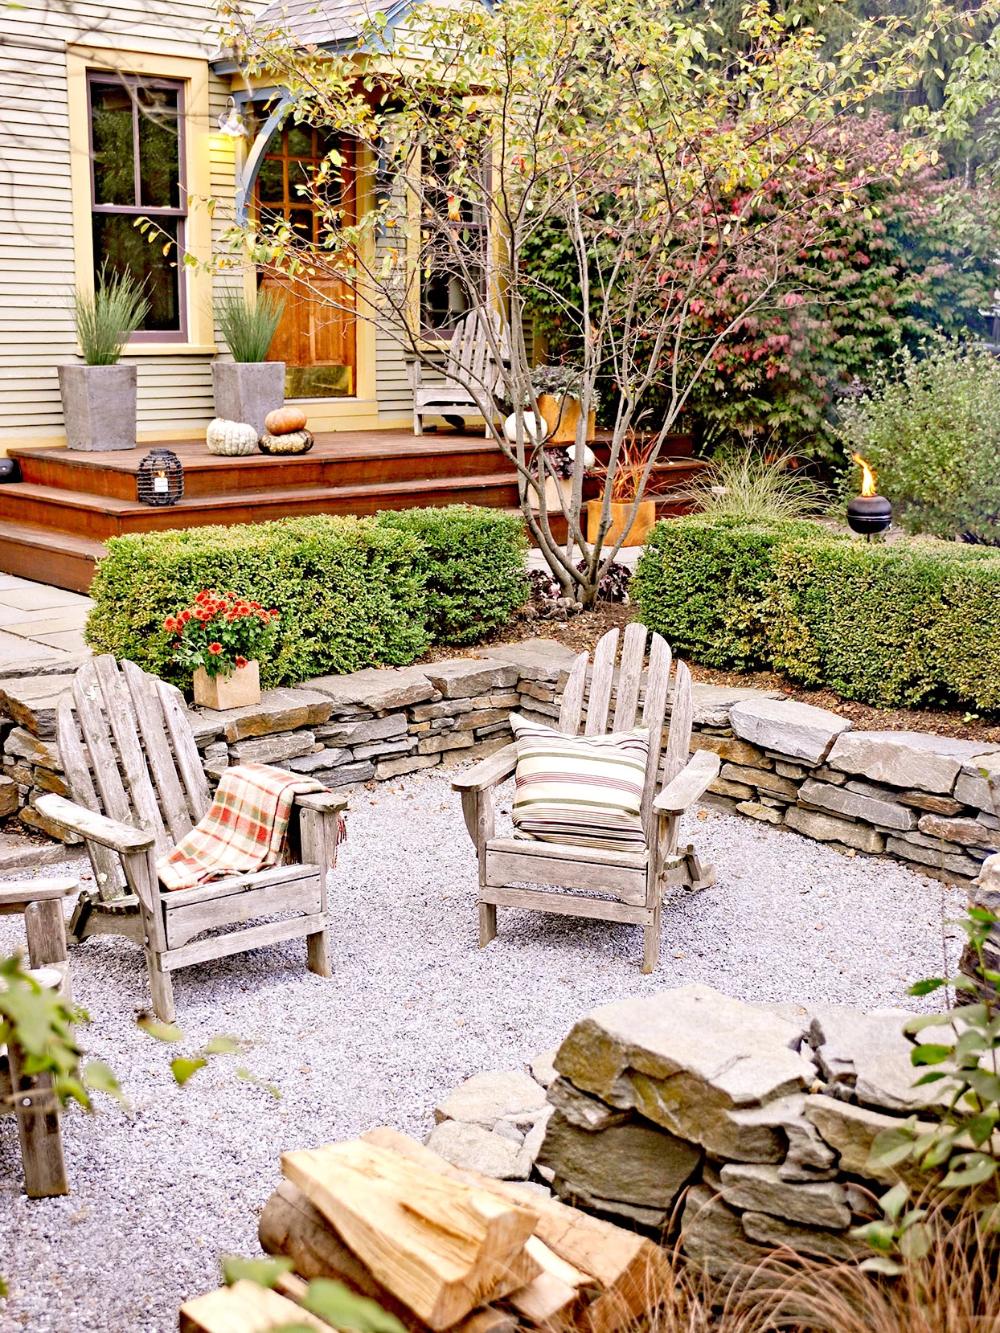 38+ Backyard pea gravel patio ideas information